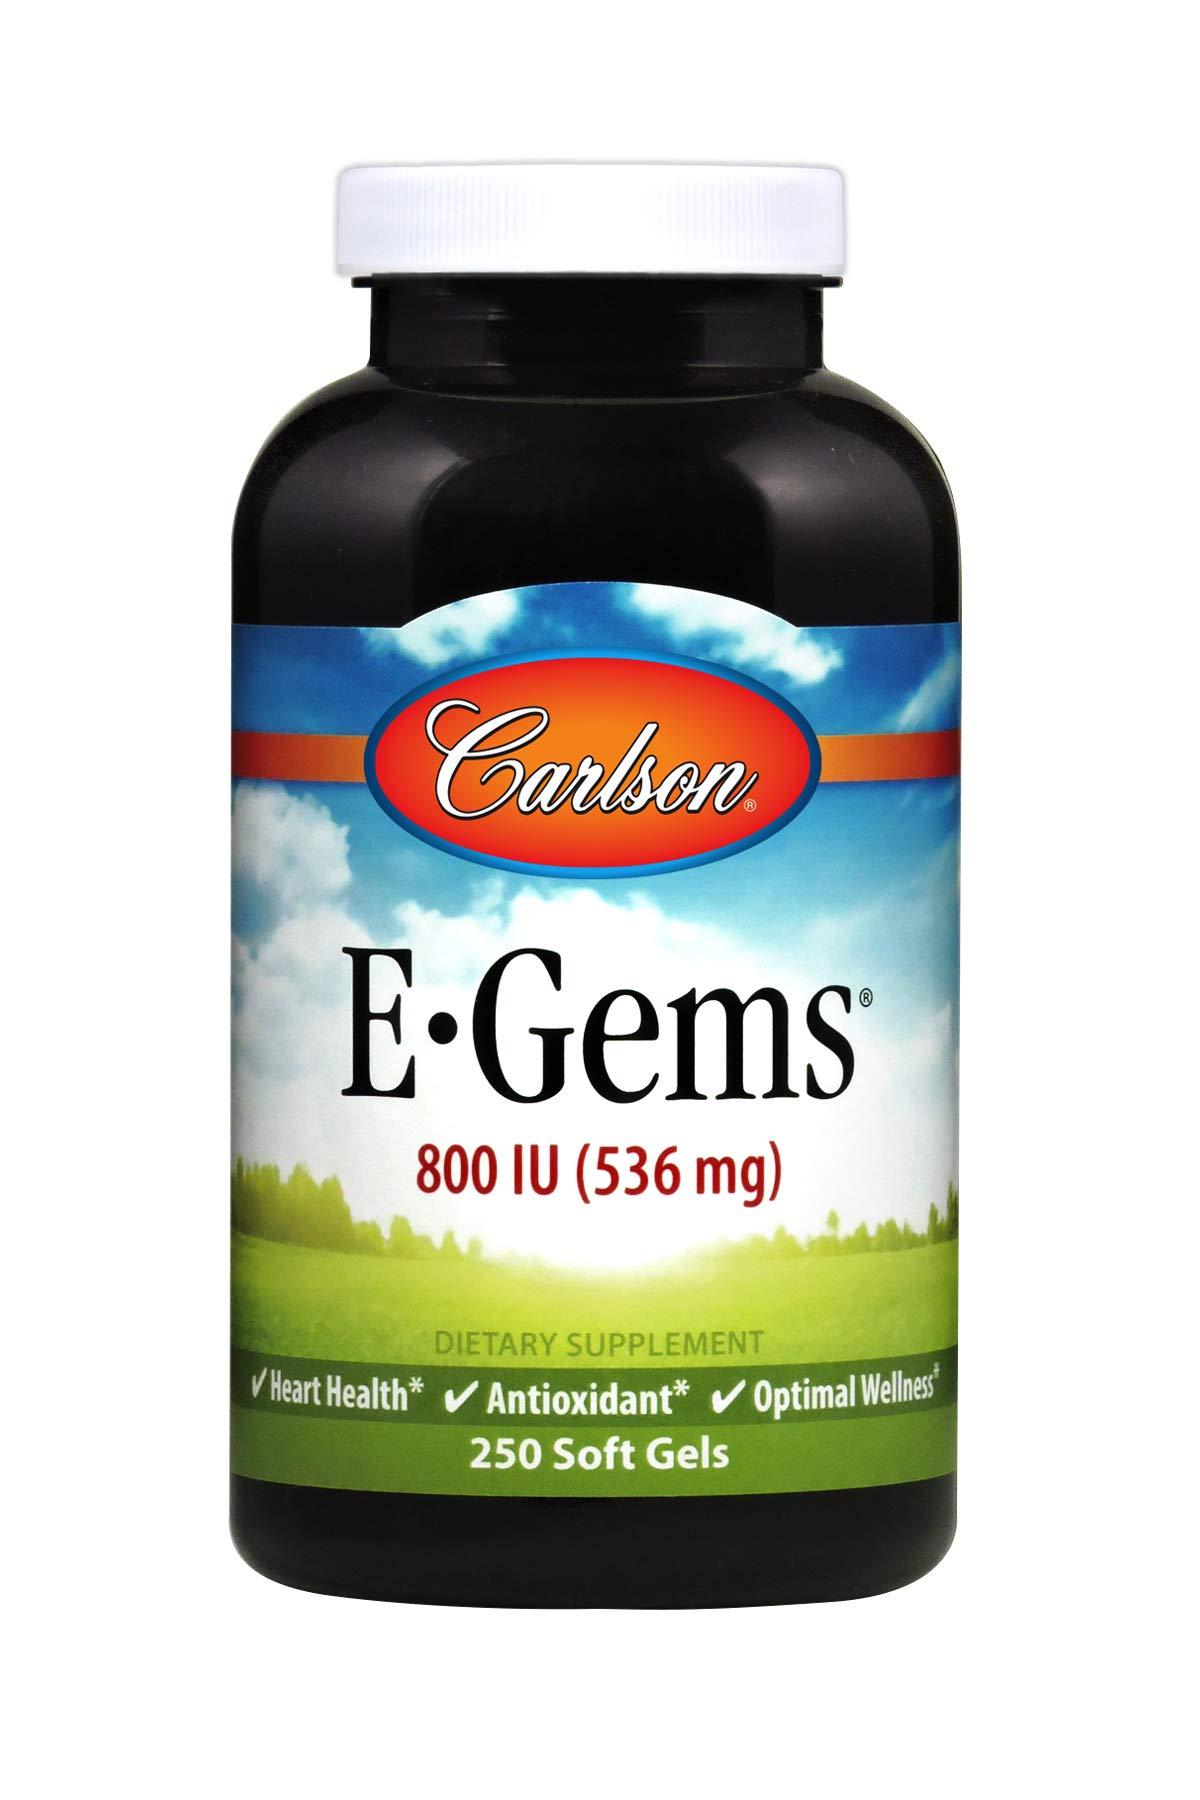 Carlson - E-Gems, 800 IU (536 mg), Heart Health & Optimal Wellness, Antioxidant, 250 soft gels by Carlson